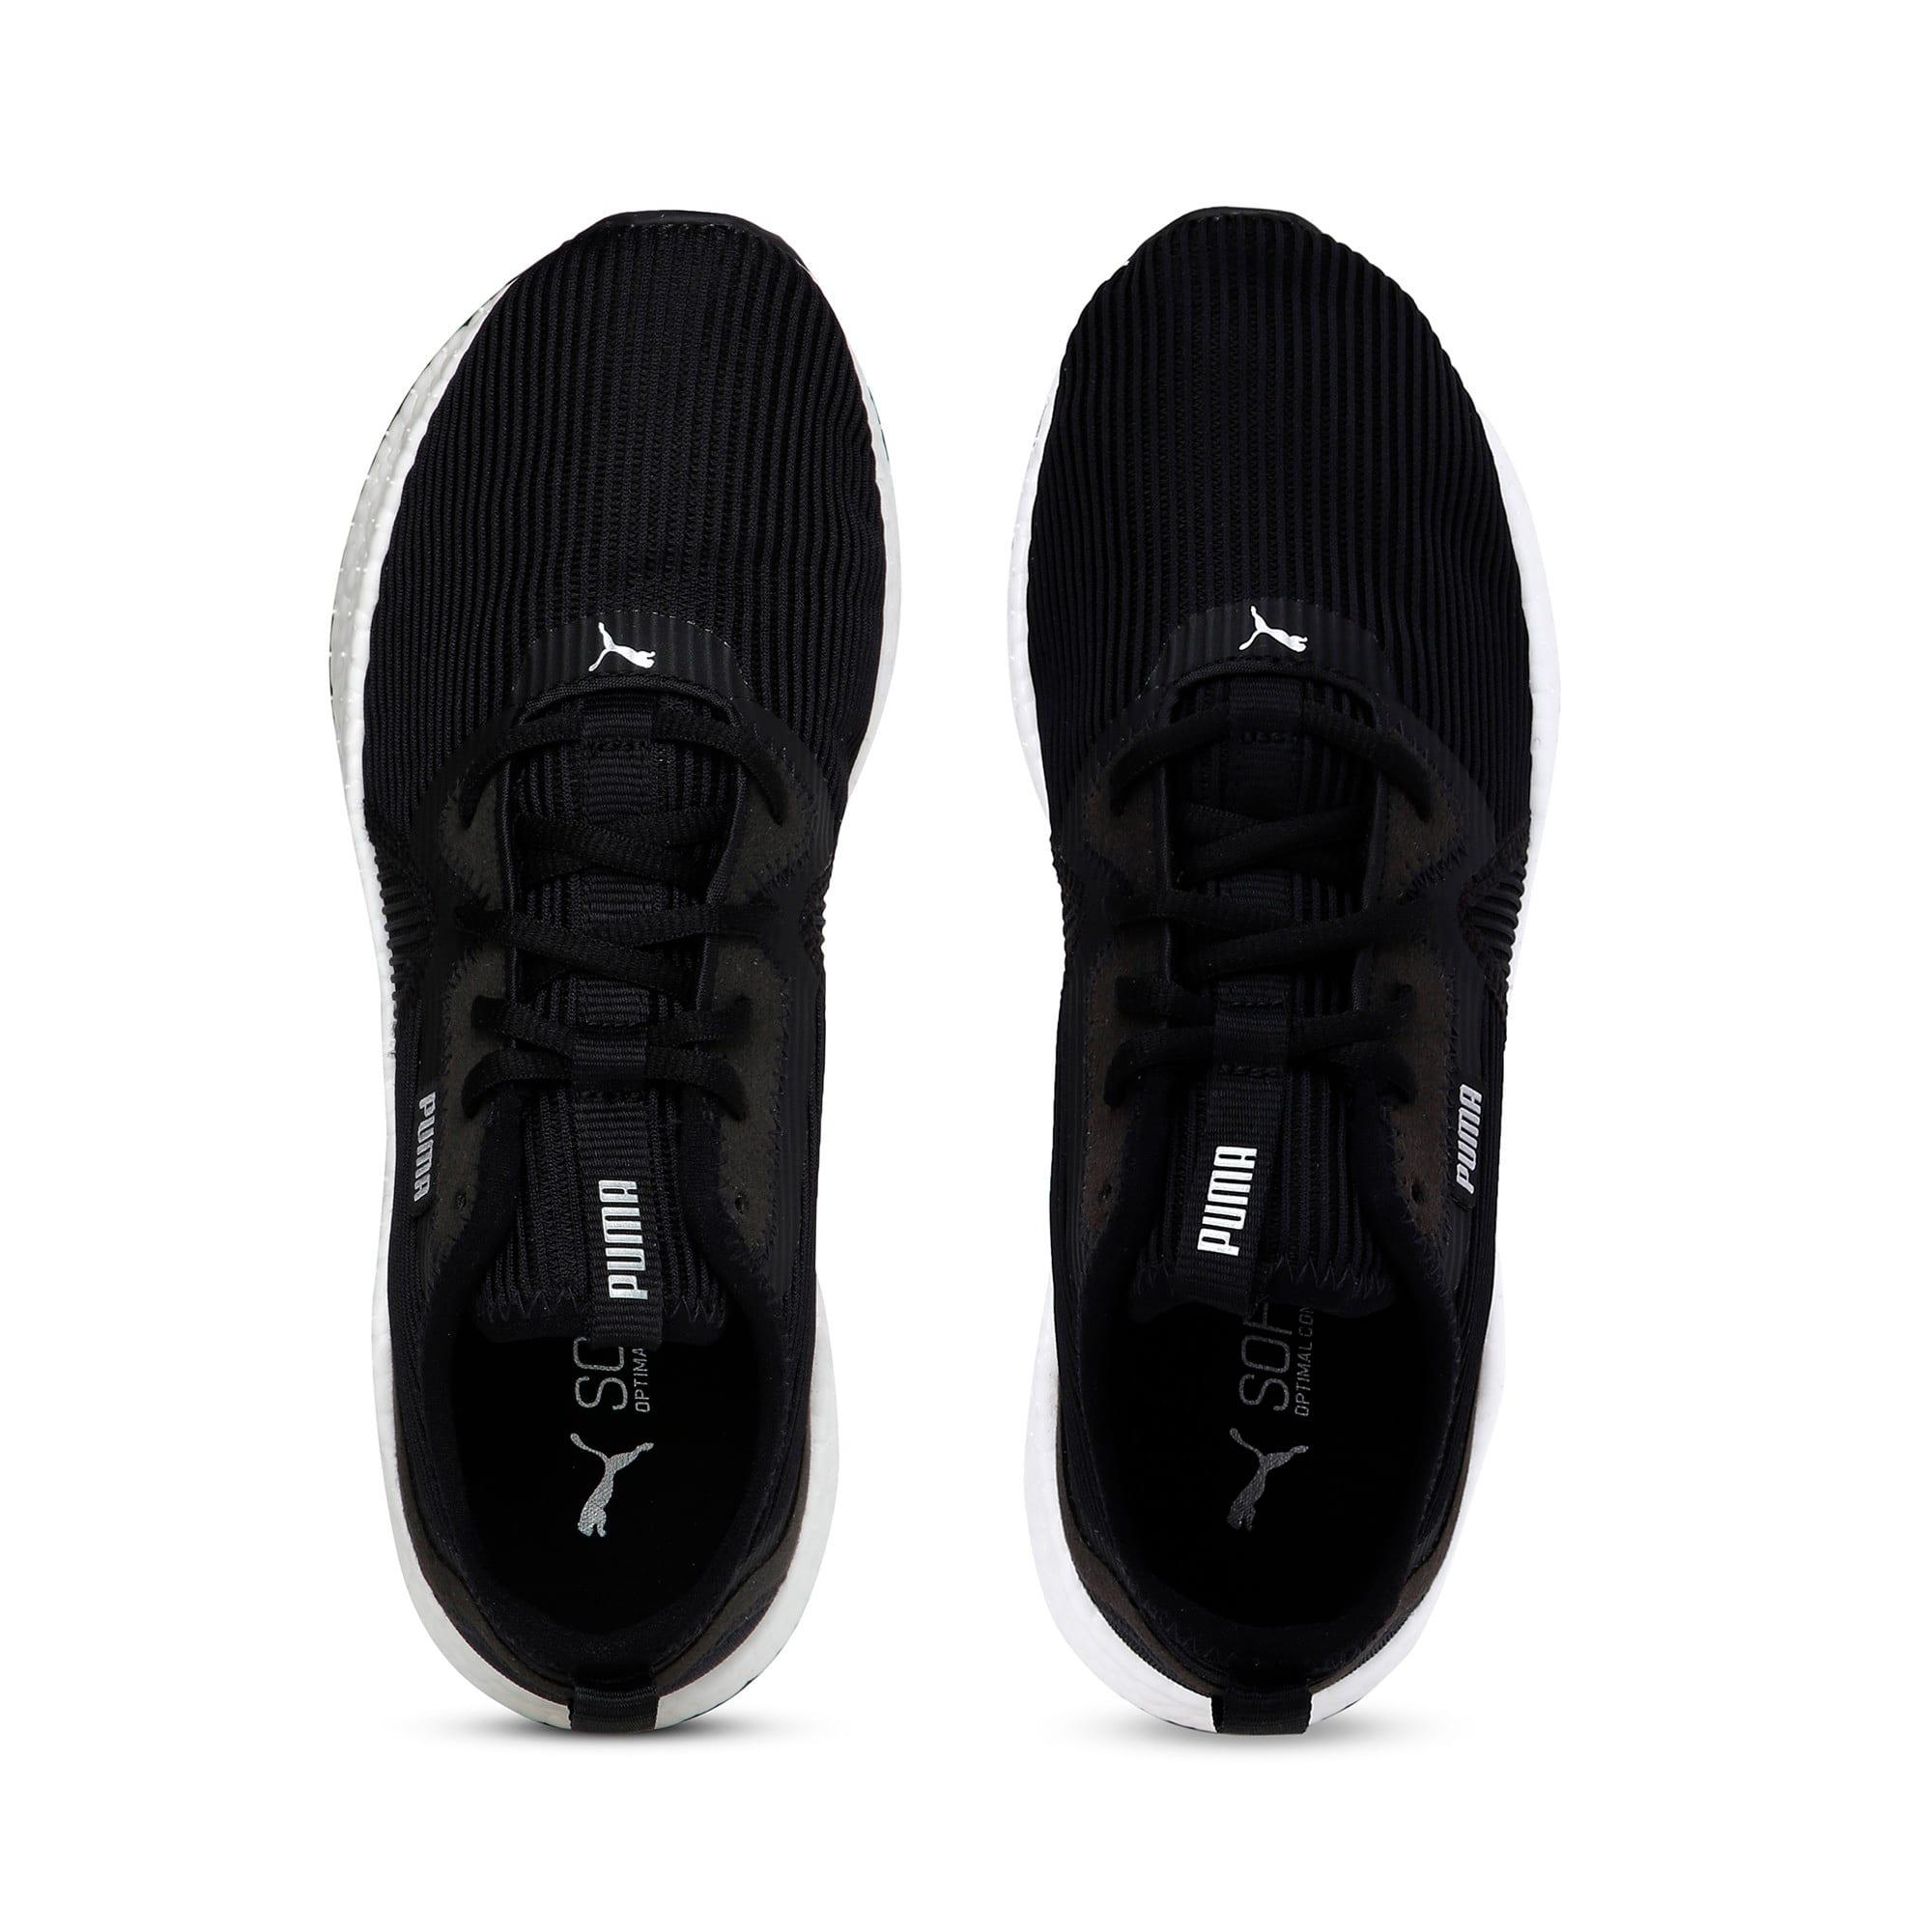 Thumbnail 8 of NRGY Star Femme Women's Running Shoes, Black-Silver-White, medium-IND